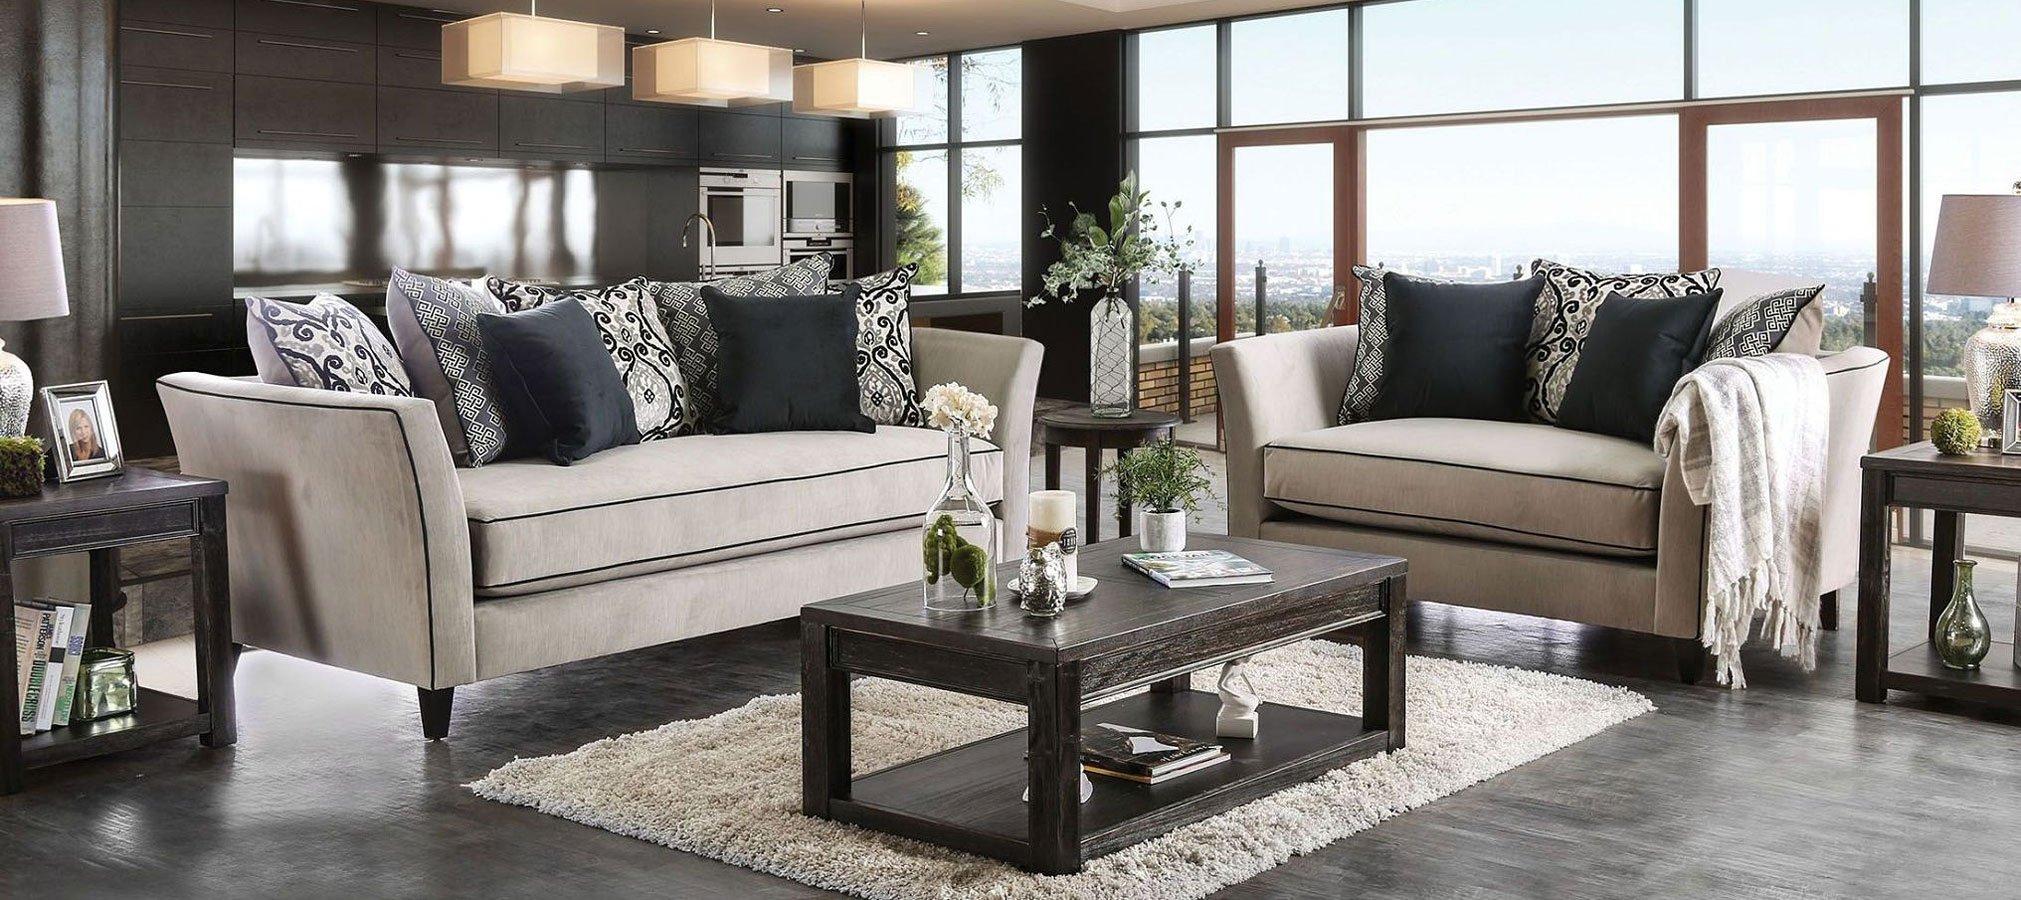 Chantal Living Room Set (Gray) by Furniture of America   FurniturePick